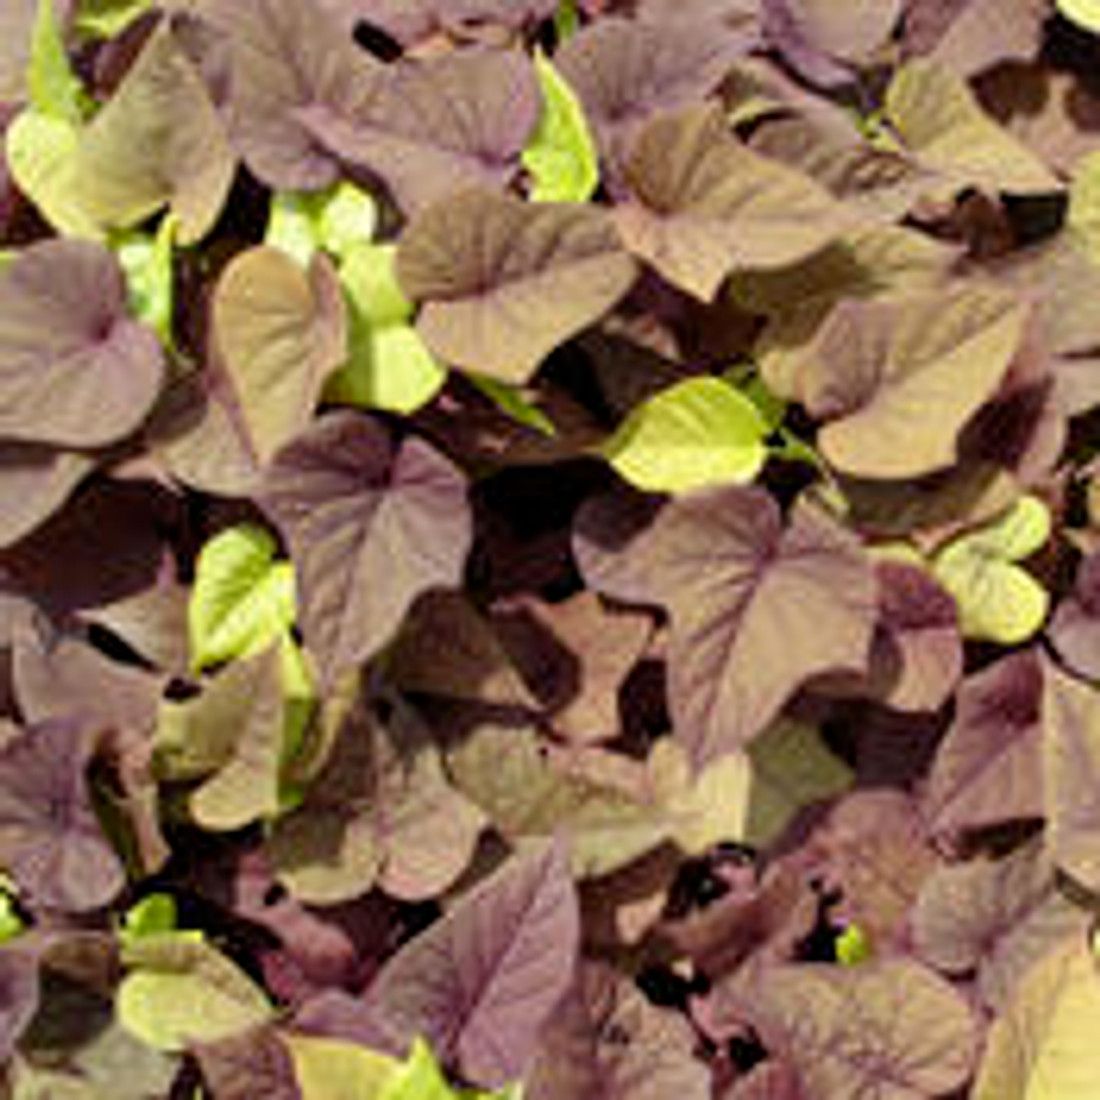 Ipomoea batatas 'Sweet Caroline Sweetheart Red' leaf